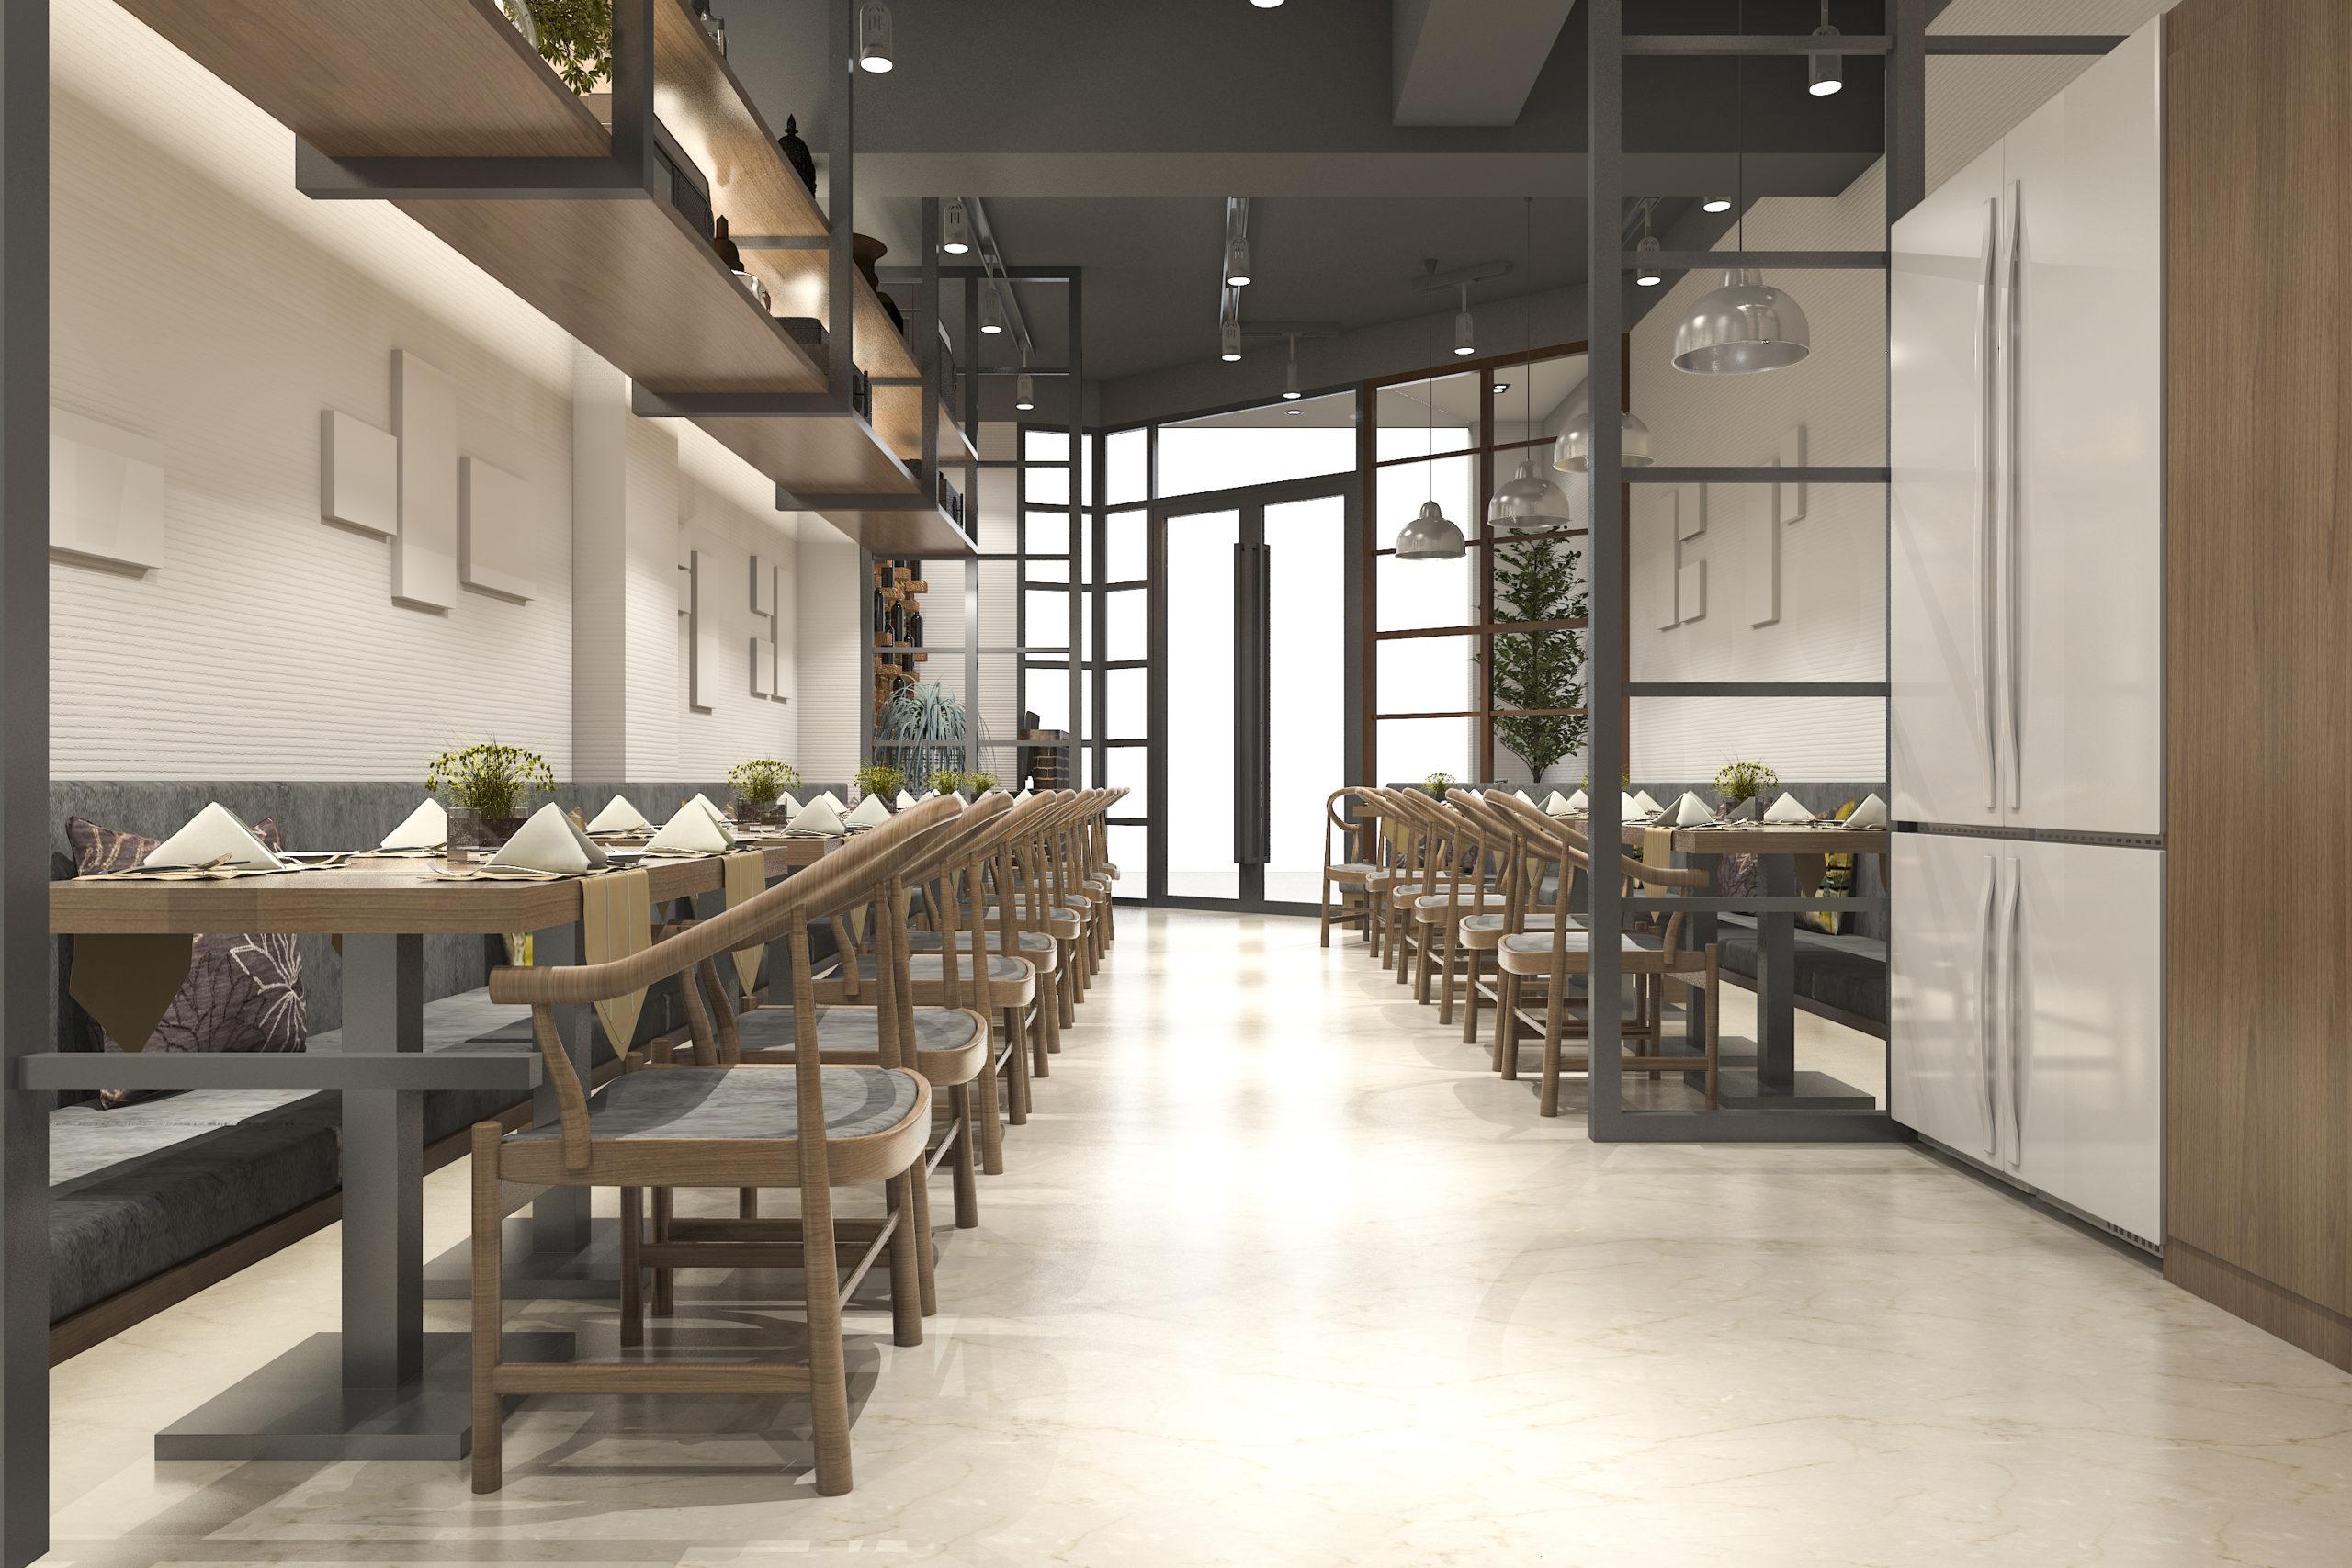 https://maharis.ma/wp-content/uploads/2021/02/3d-rendering-loft-wood-luxury-hotel-reception-and-SQHQTSM-scaled.jpg